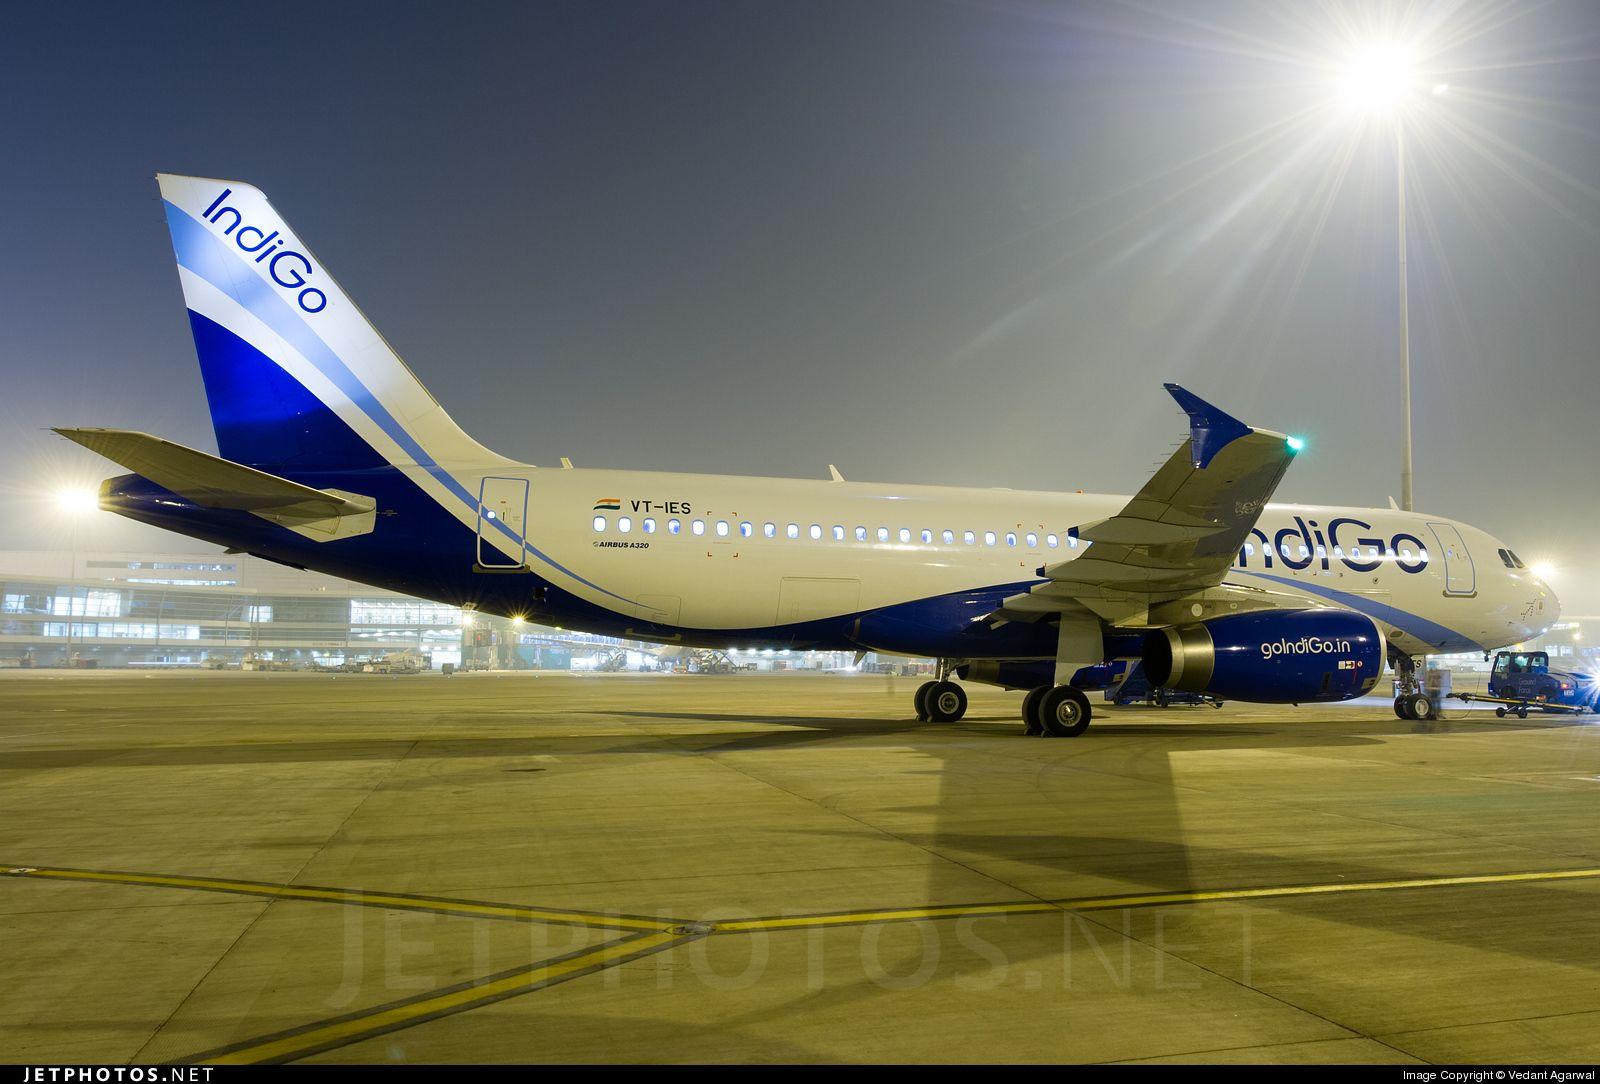 Indigo Airbus A320232 VTIES 5090 Delhi Indira Gandhi Int